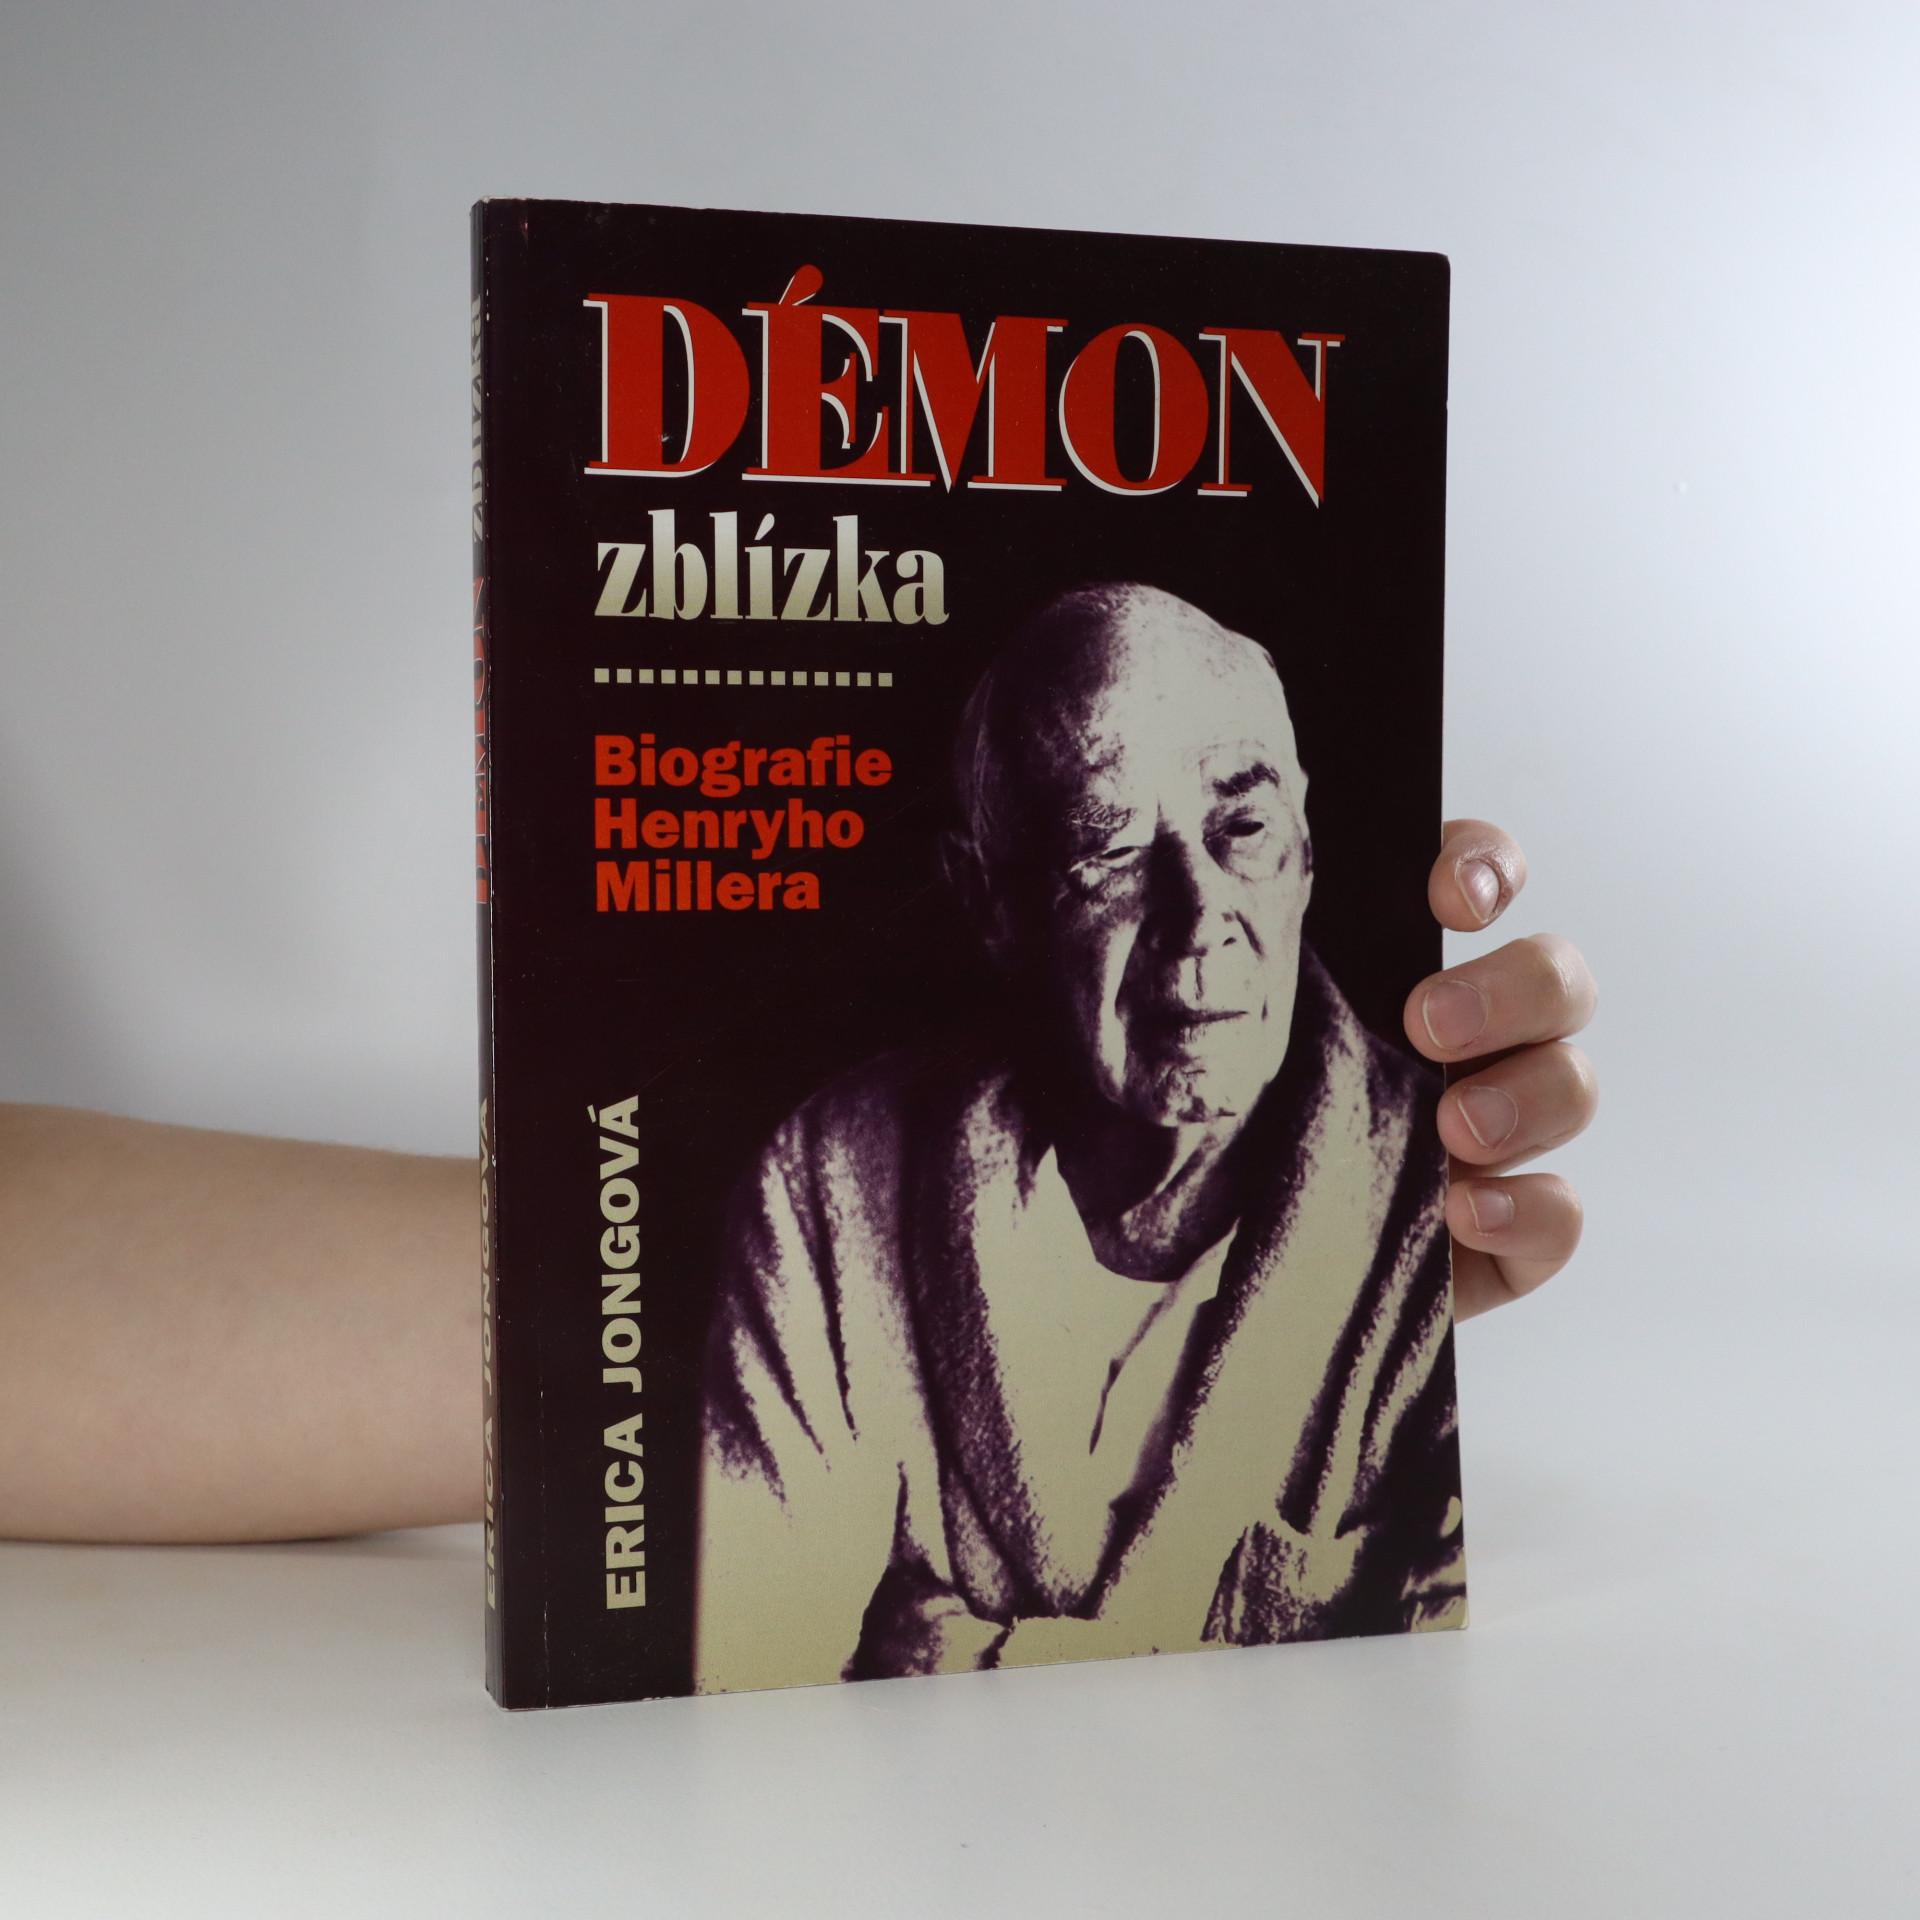 antikvární kniha Démon zblízka. Biografie Henryho Millera, 1994